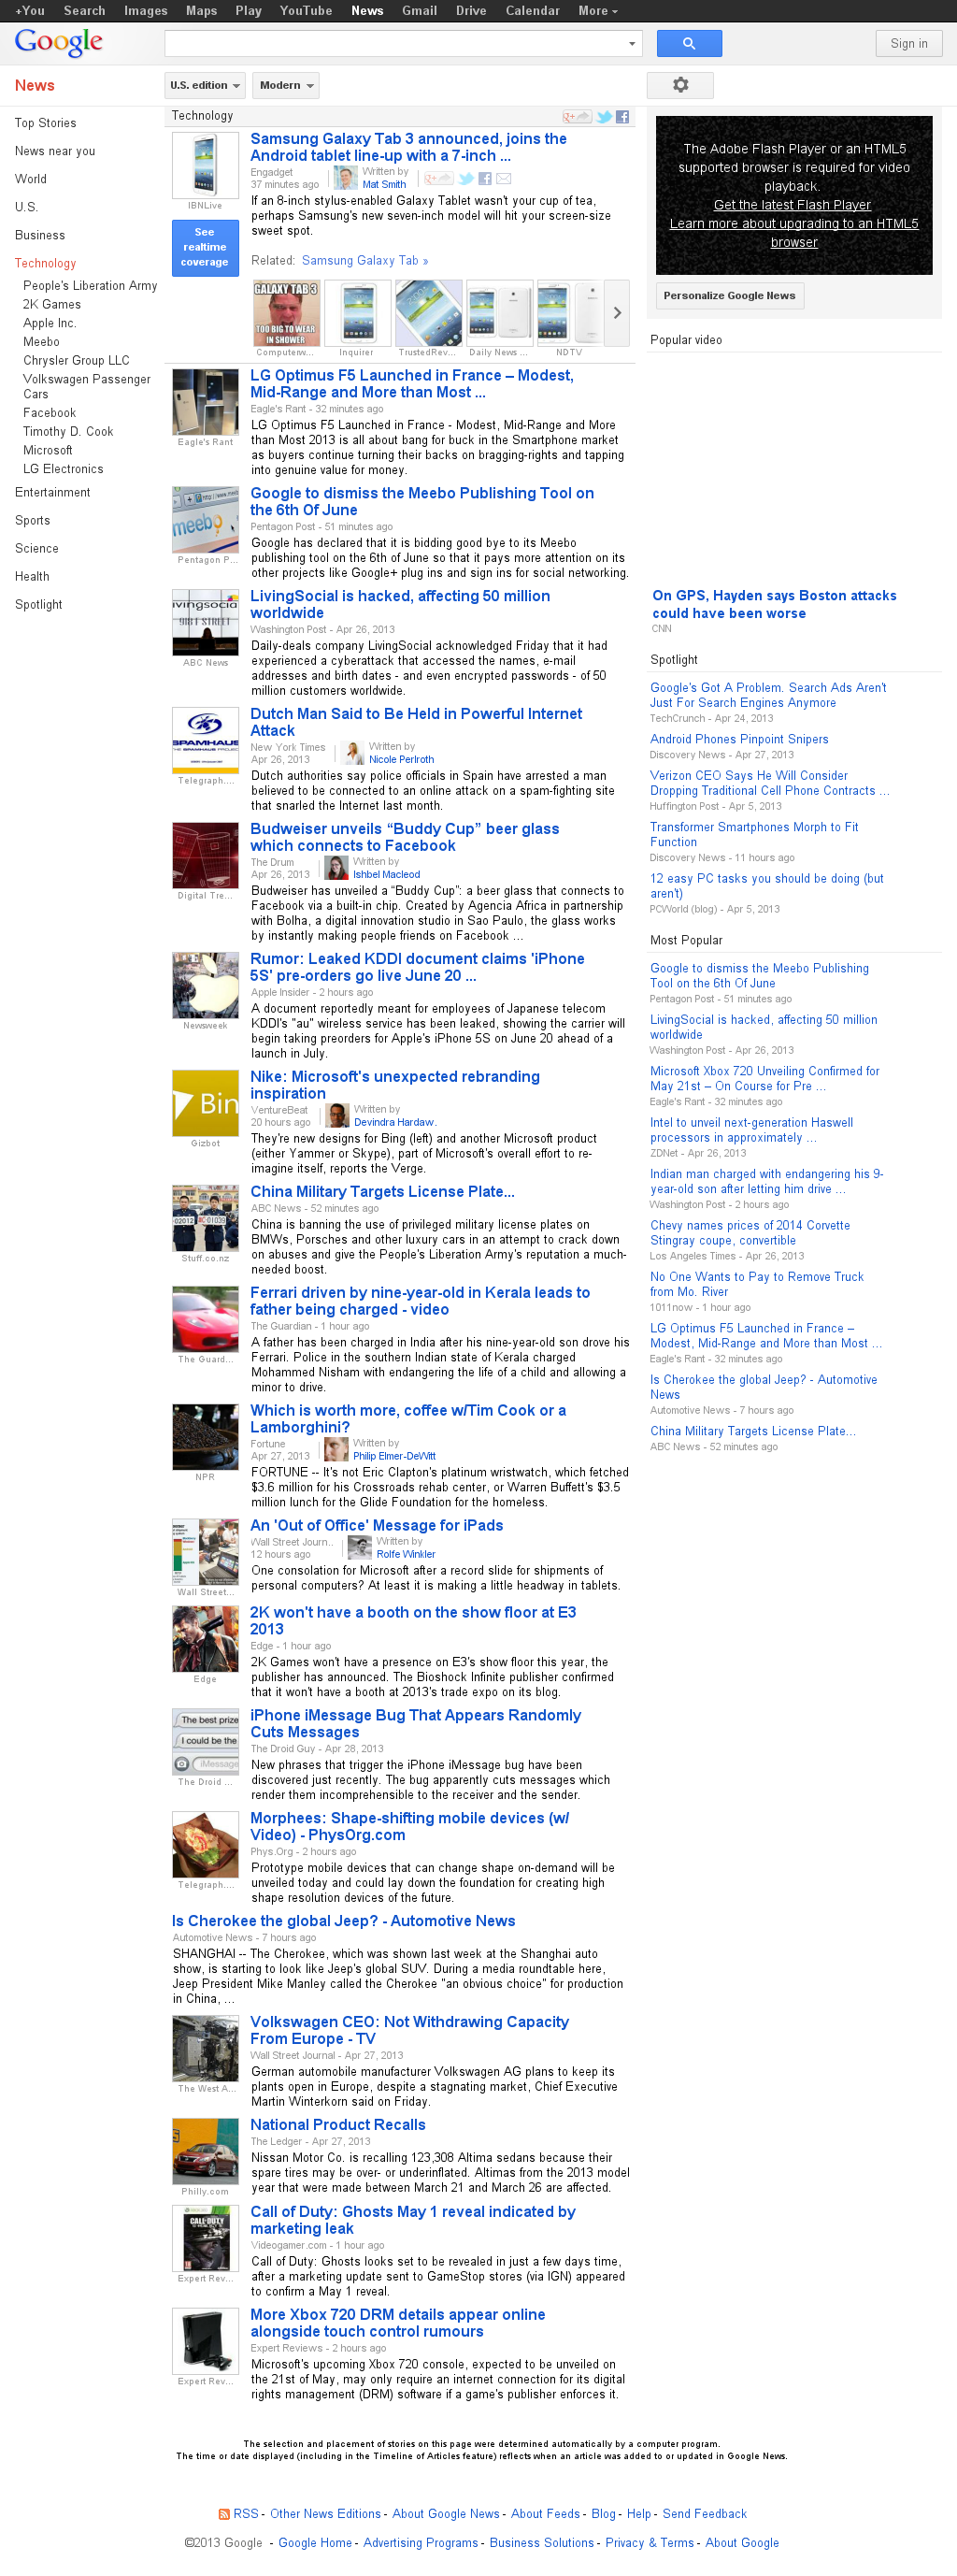 Google News: Technology at Monday April 29, 2013, 11:09 a.m. UTC